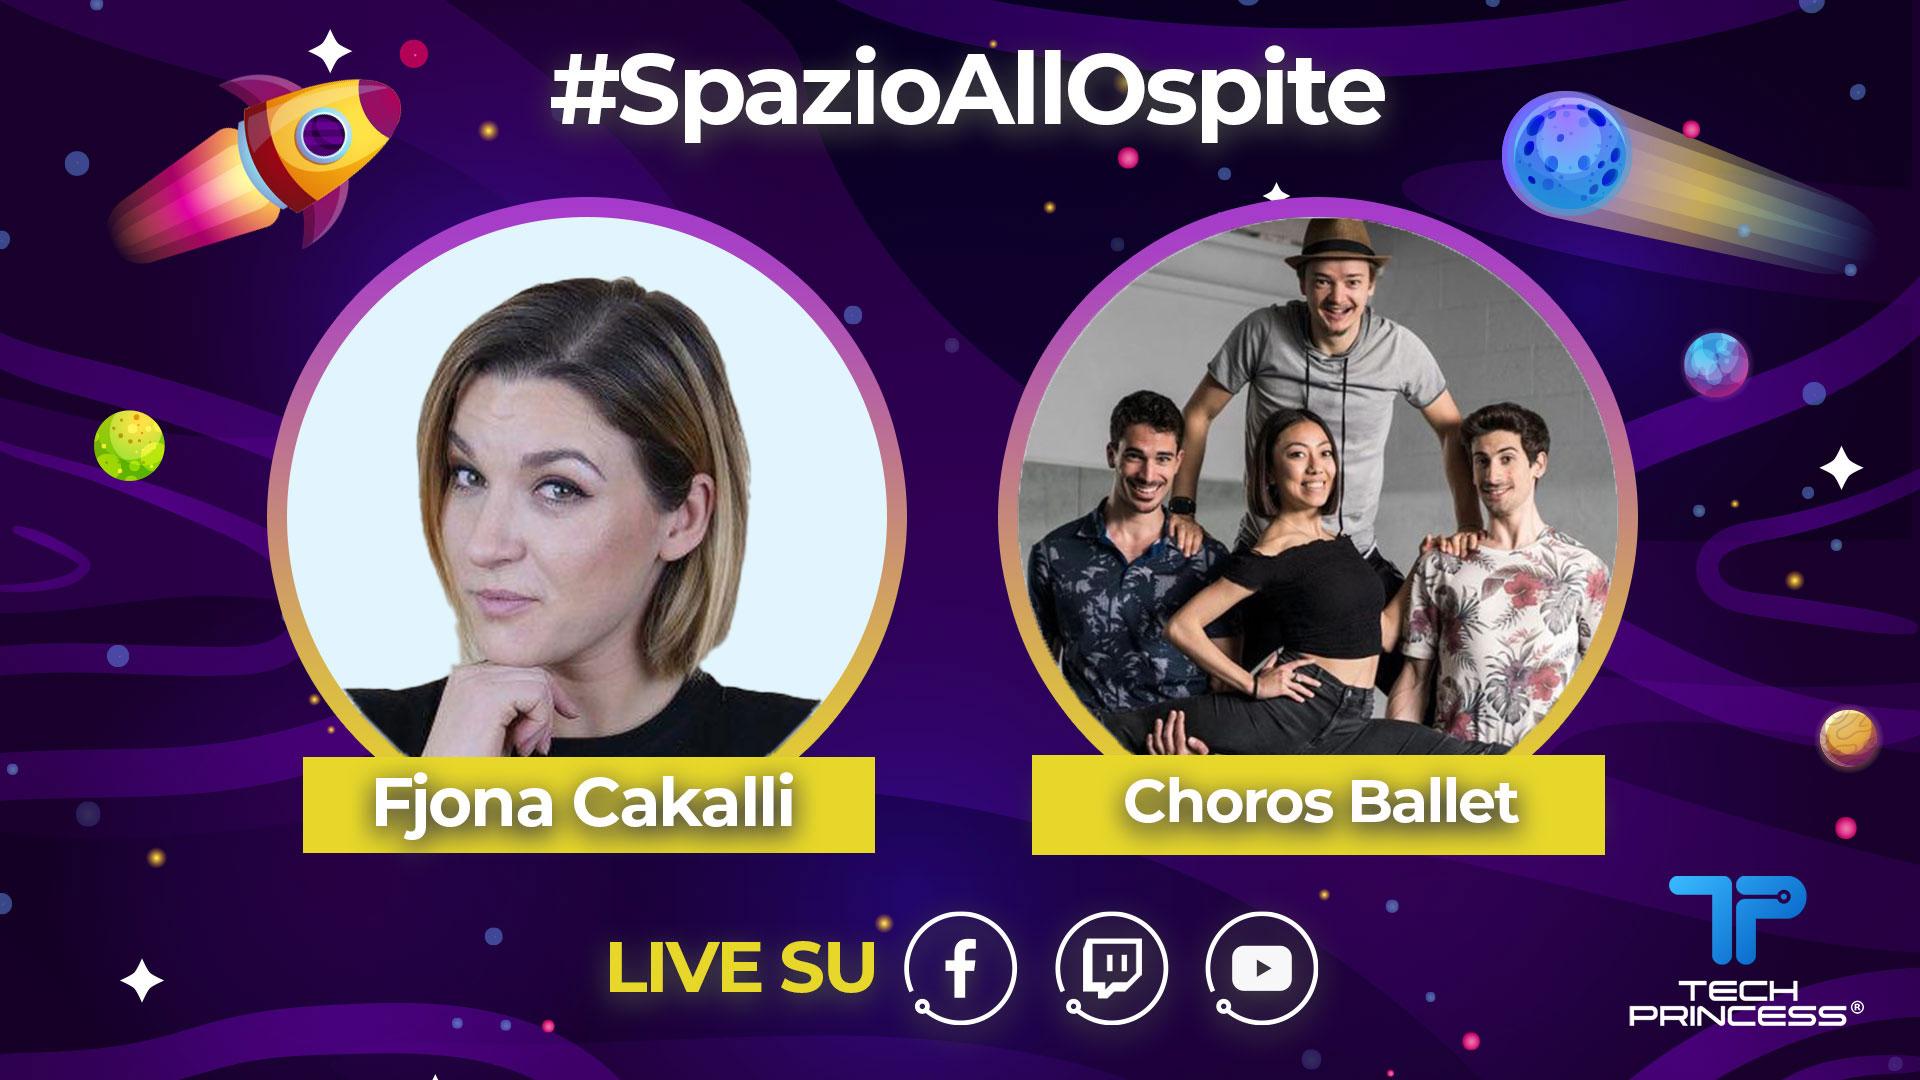 Choros Ballet: intervista in diretta mercoledì 20 maggio ore 18.30 | #SpazioAllOspite thumbnail